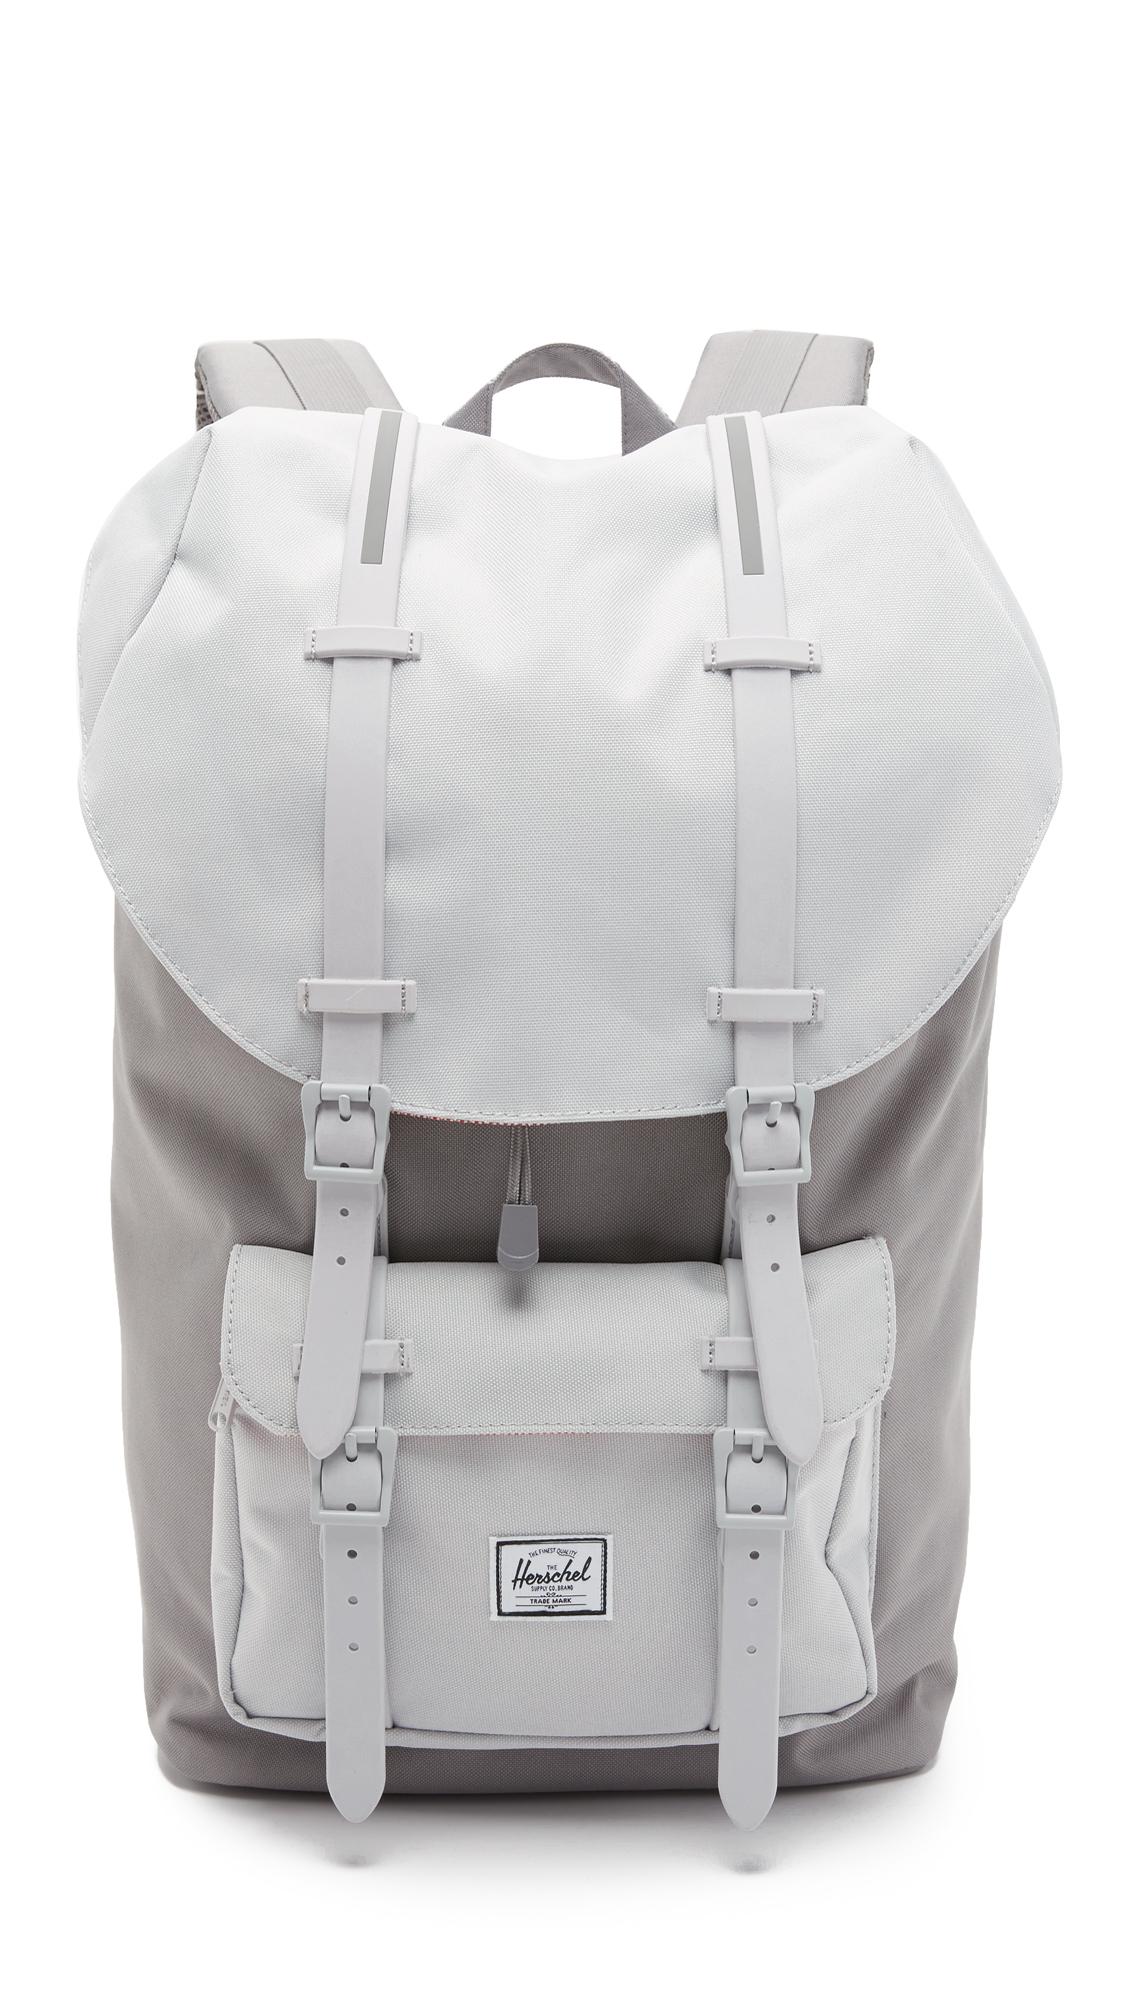 Herschel Supply Co. Little America Backpack in Gray for Men - Lyst f4158e16938d0